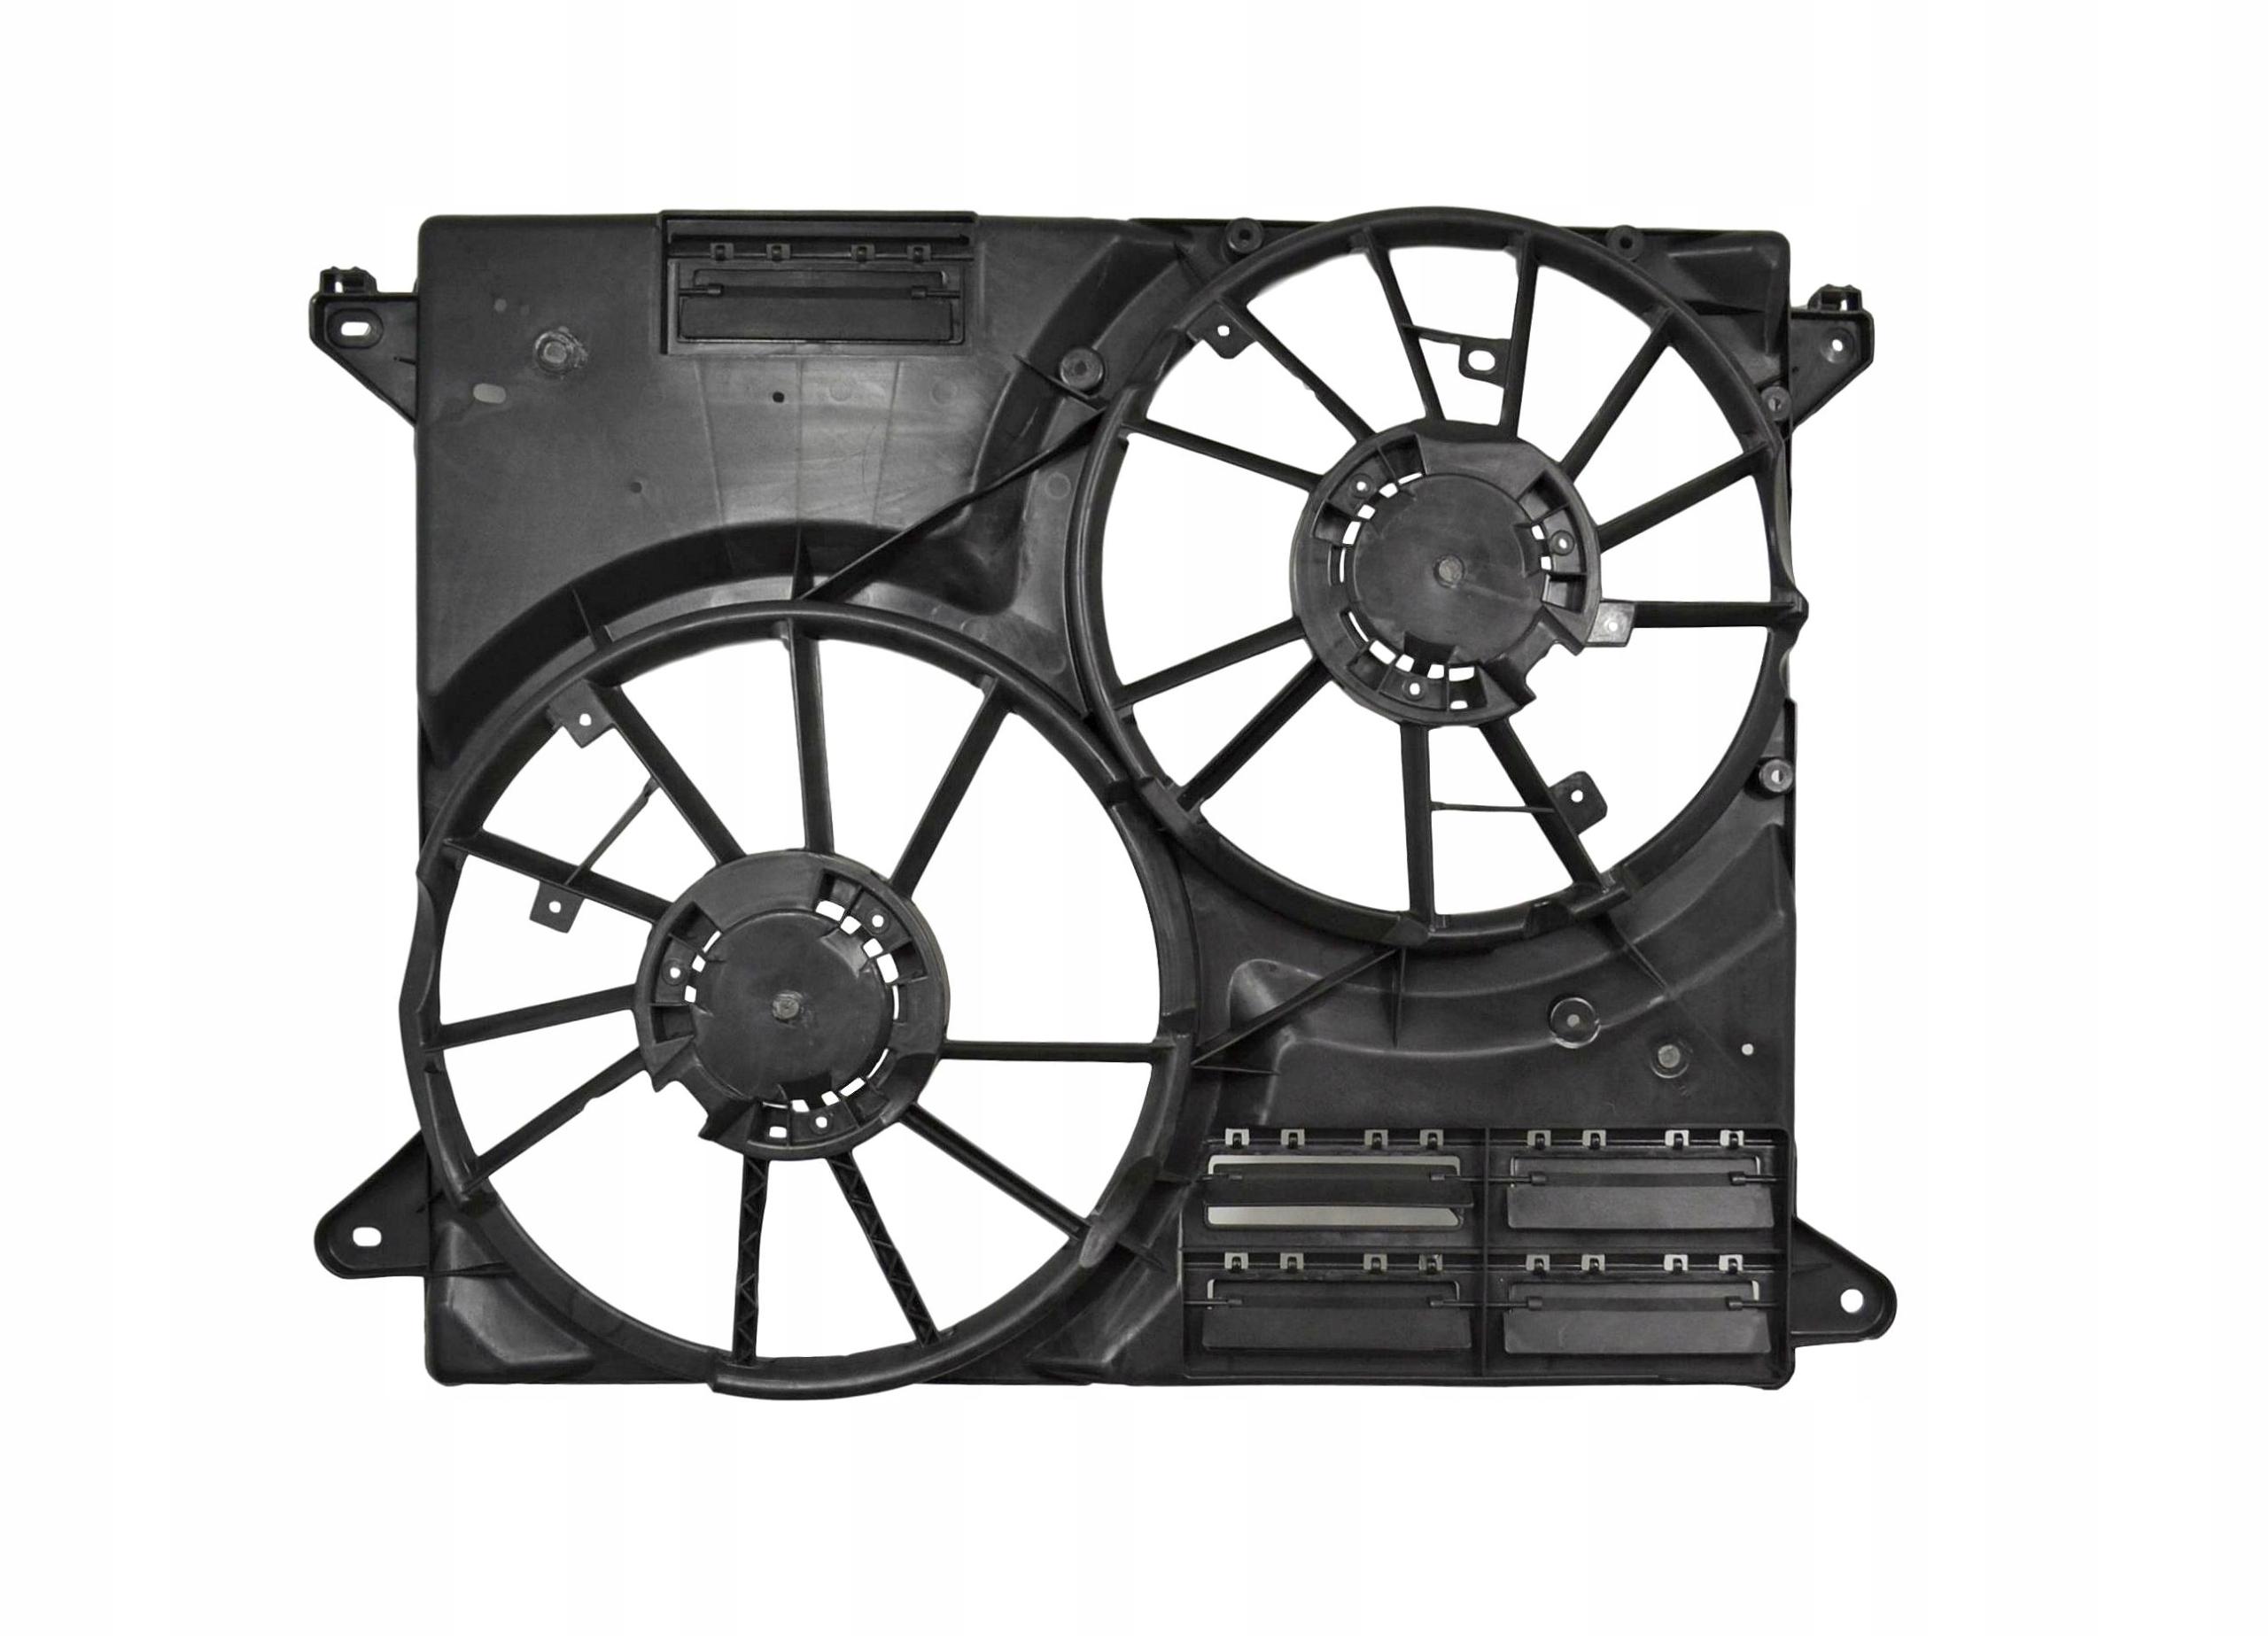 новая корпус вентилятор ford edge 2 0 2 7 3 0 14-